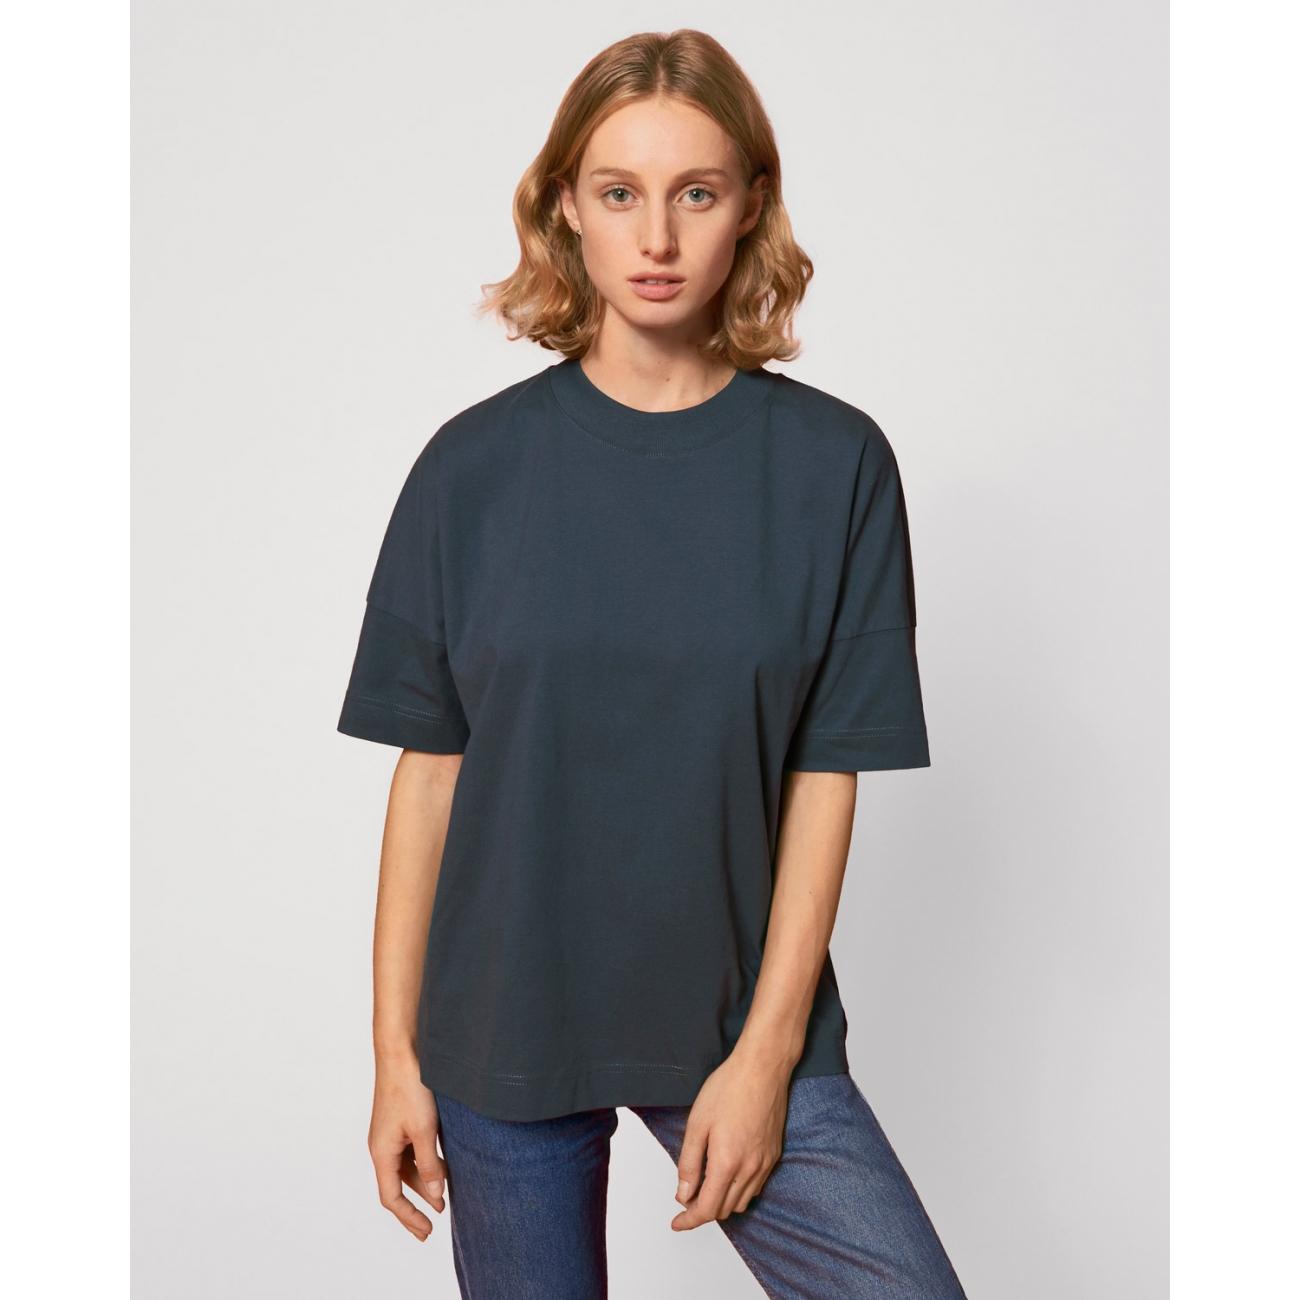 https://tee-shirt-bio.com/9980-thickbox_default/tee-shirt-oversize-epais-en-coton-bio-col-montant-emmanchures-basses-gris-indien.jpg